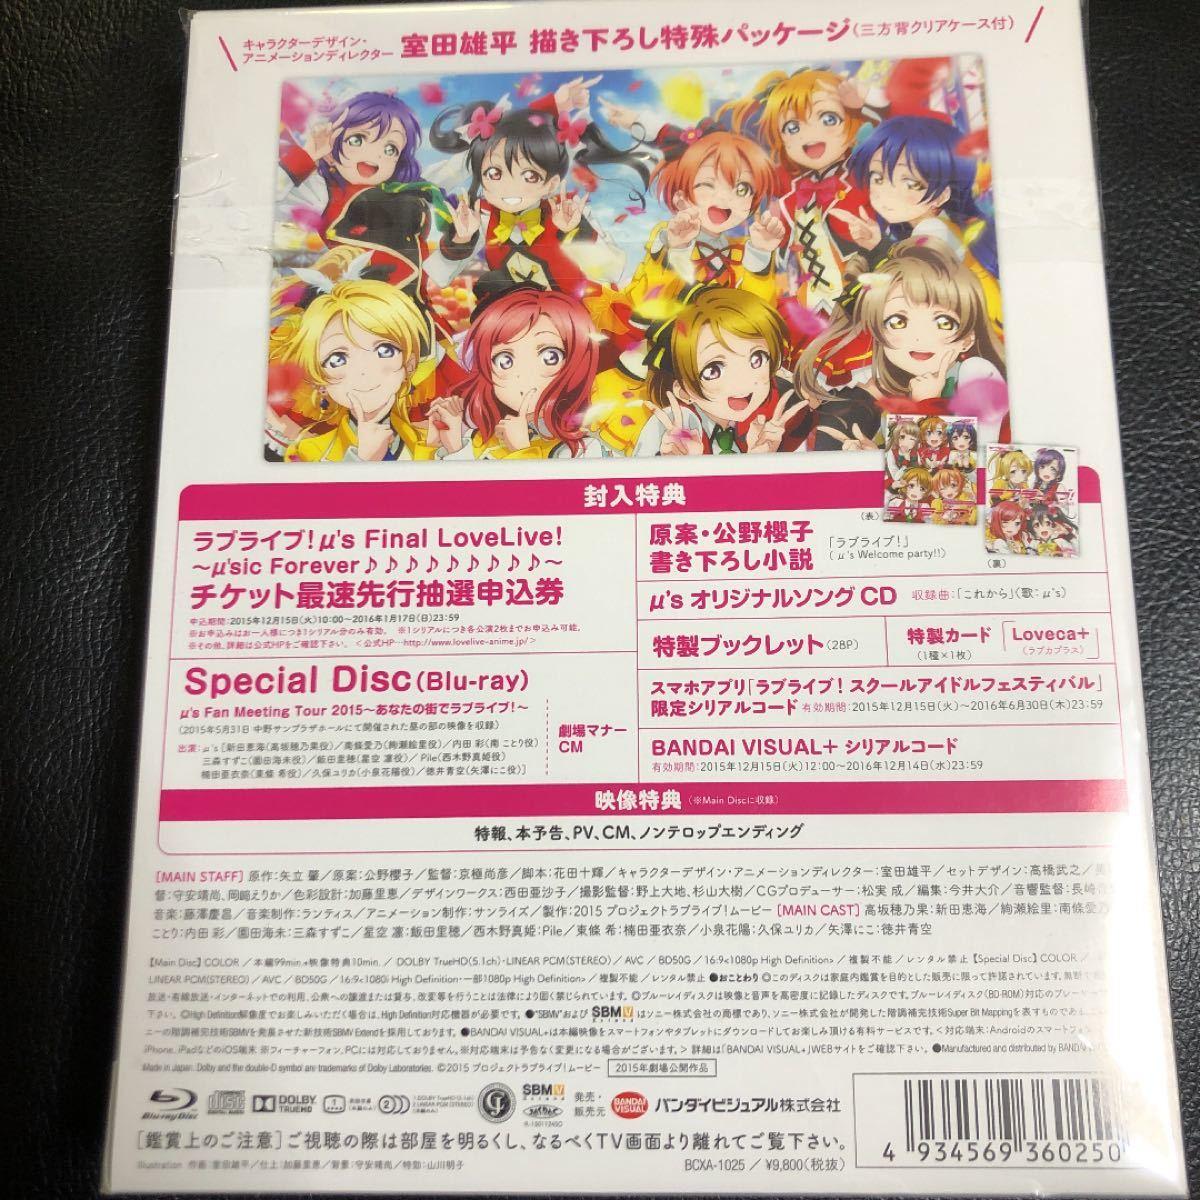 【BLU-R】 ラブライブ!The School Idol Movie特装限定版